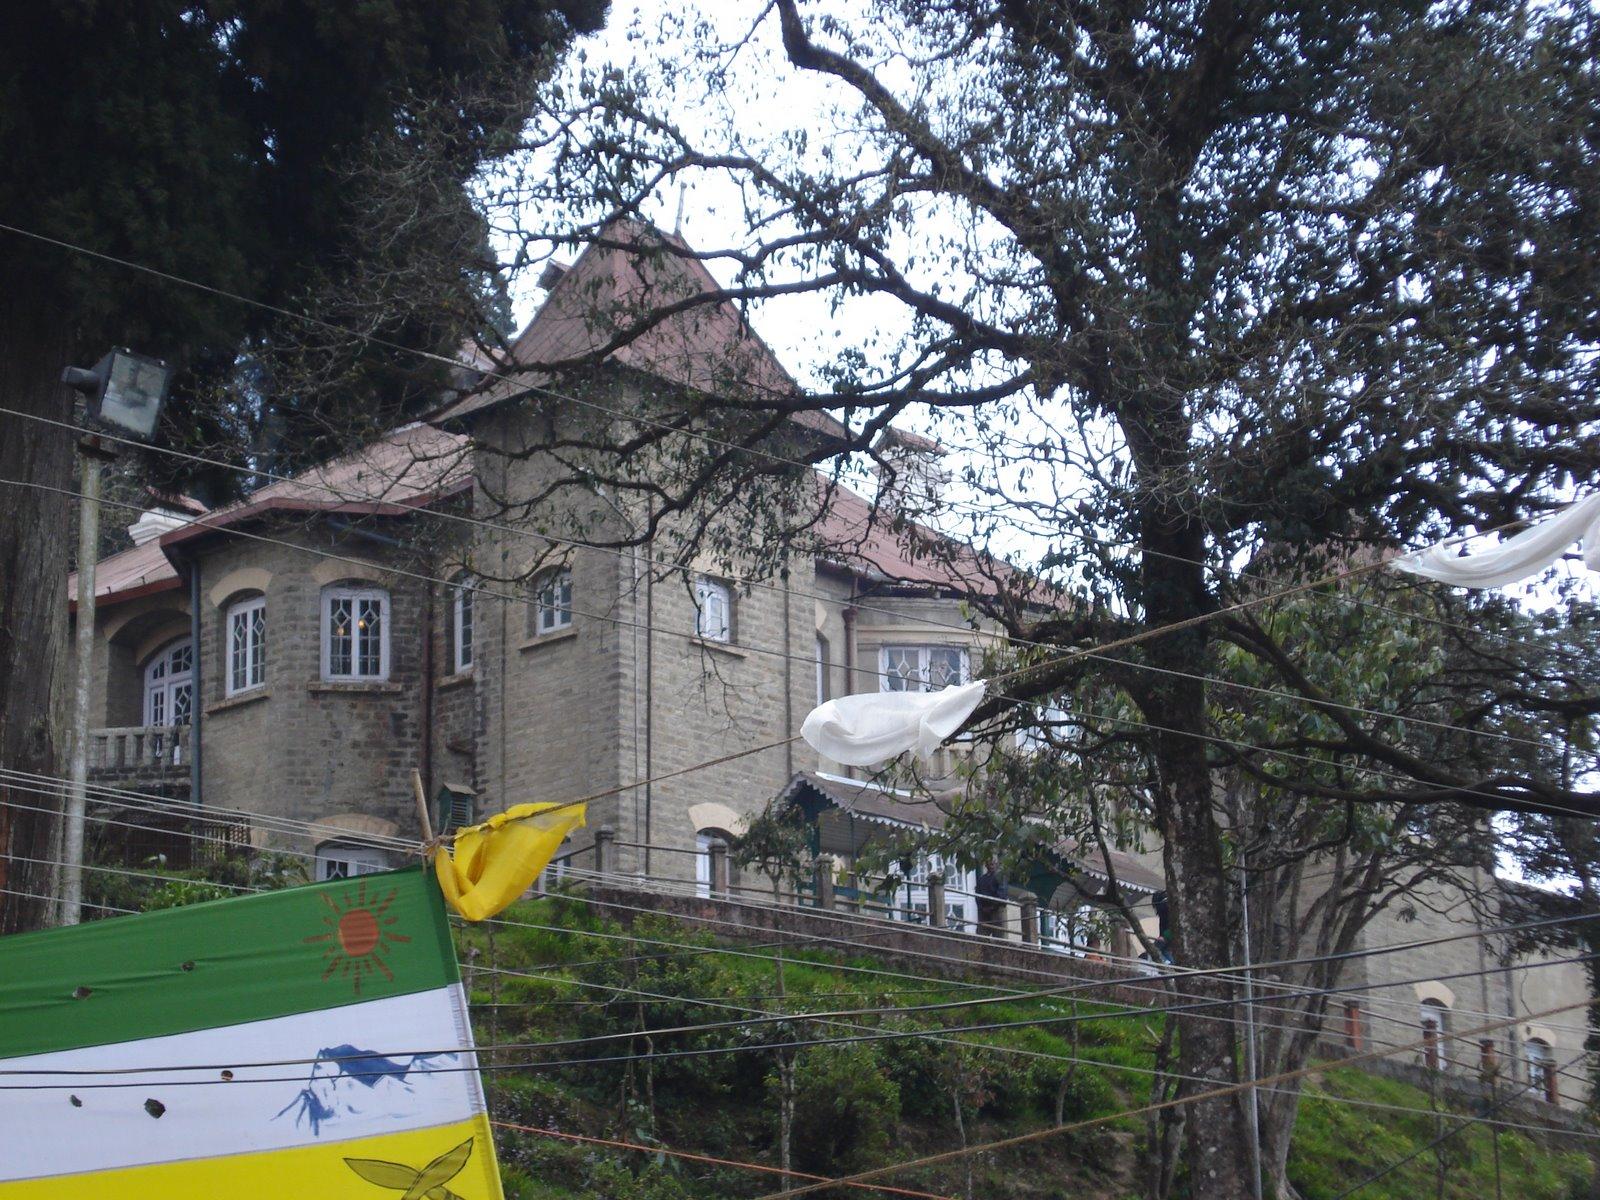 http://1.bp.blogspot.com/_2tE57PZSvMk/S9vCT16VkBI/AAAAAAAAAVg/G8C7MNIISzM/s1600/Loreto+College+Darjeeling+3-20-2008+11-31-31+AM+3072x2304.JPG